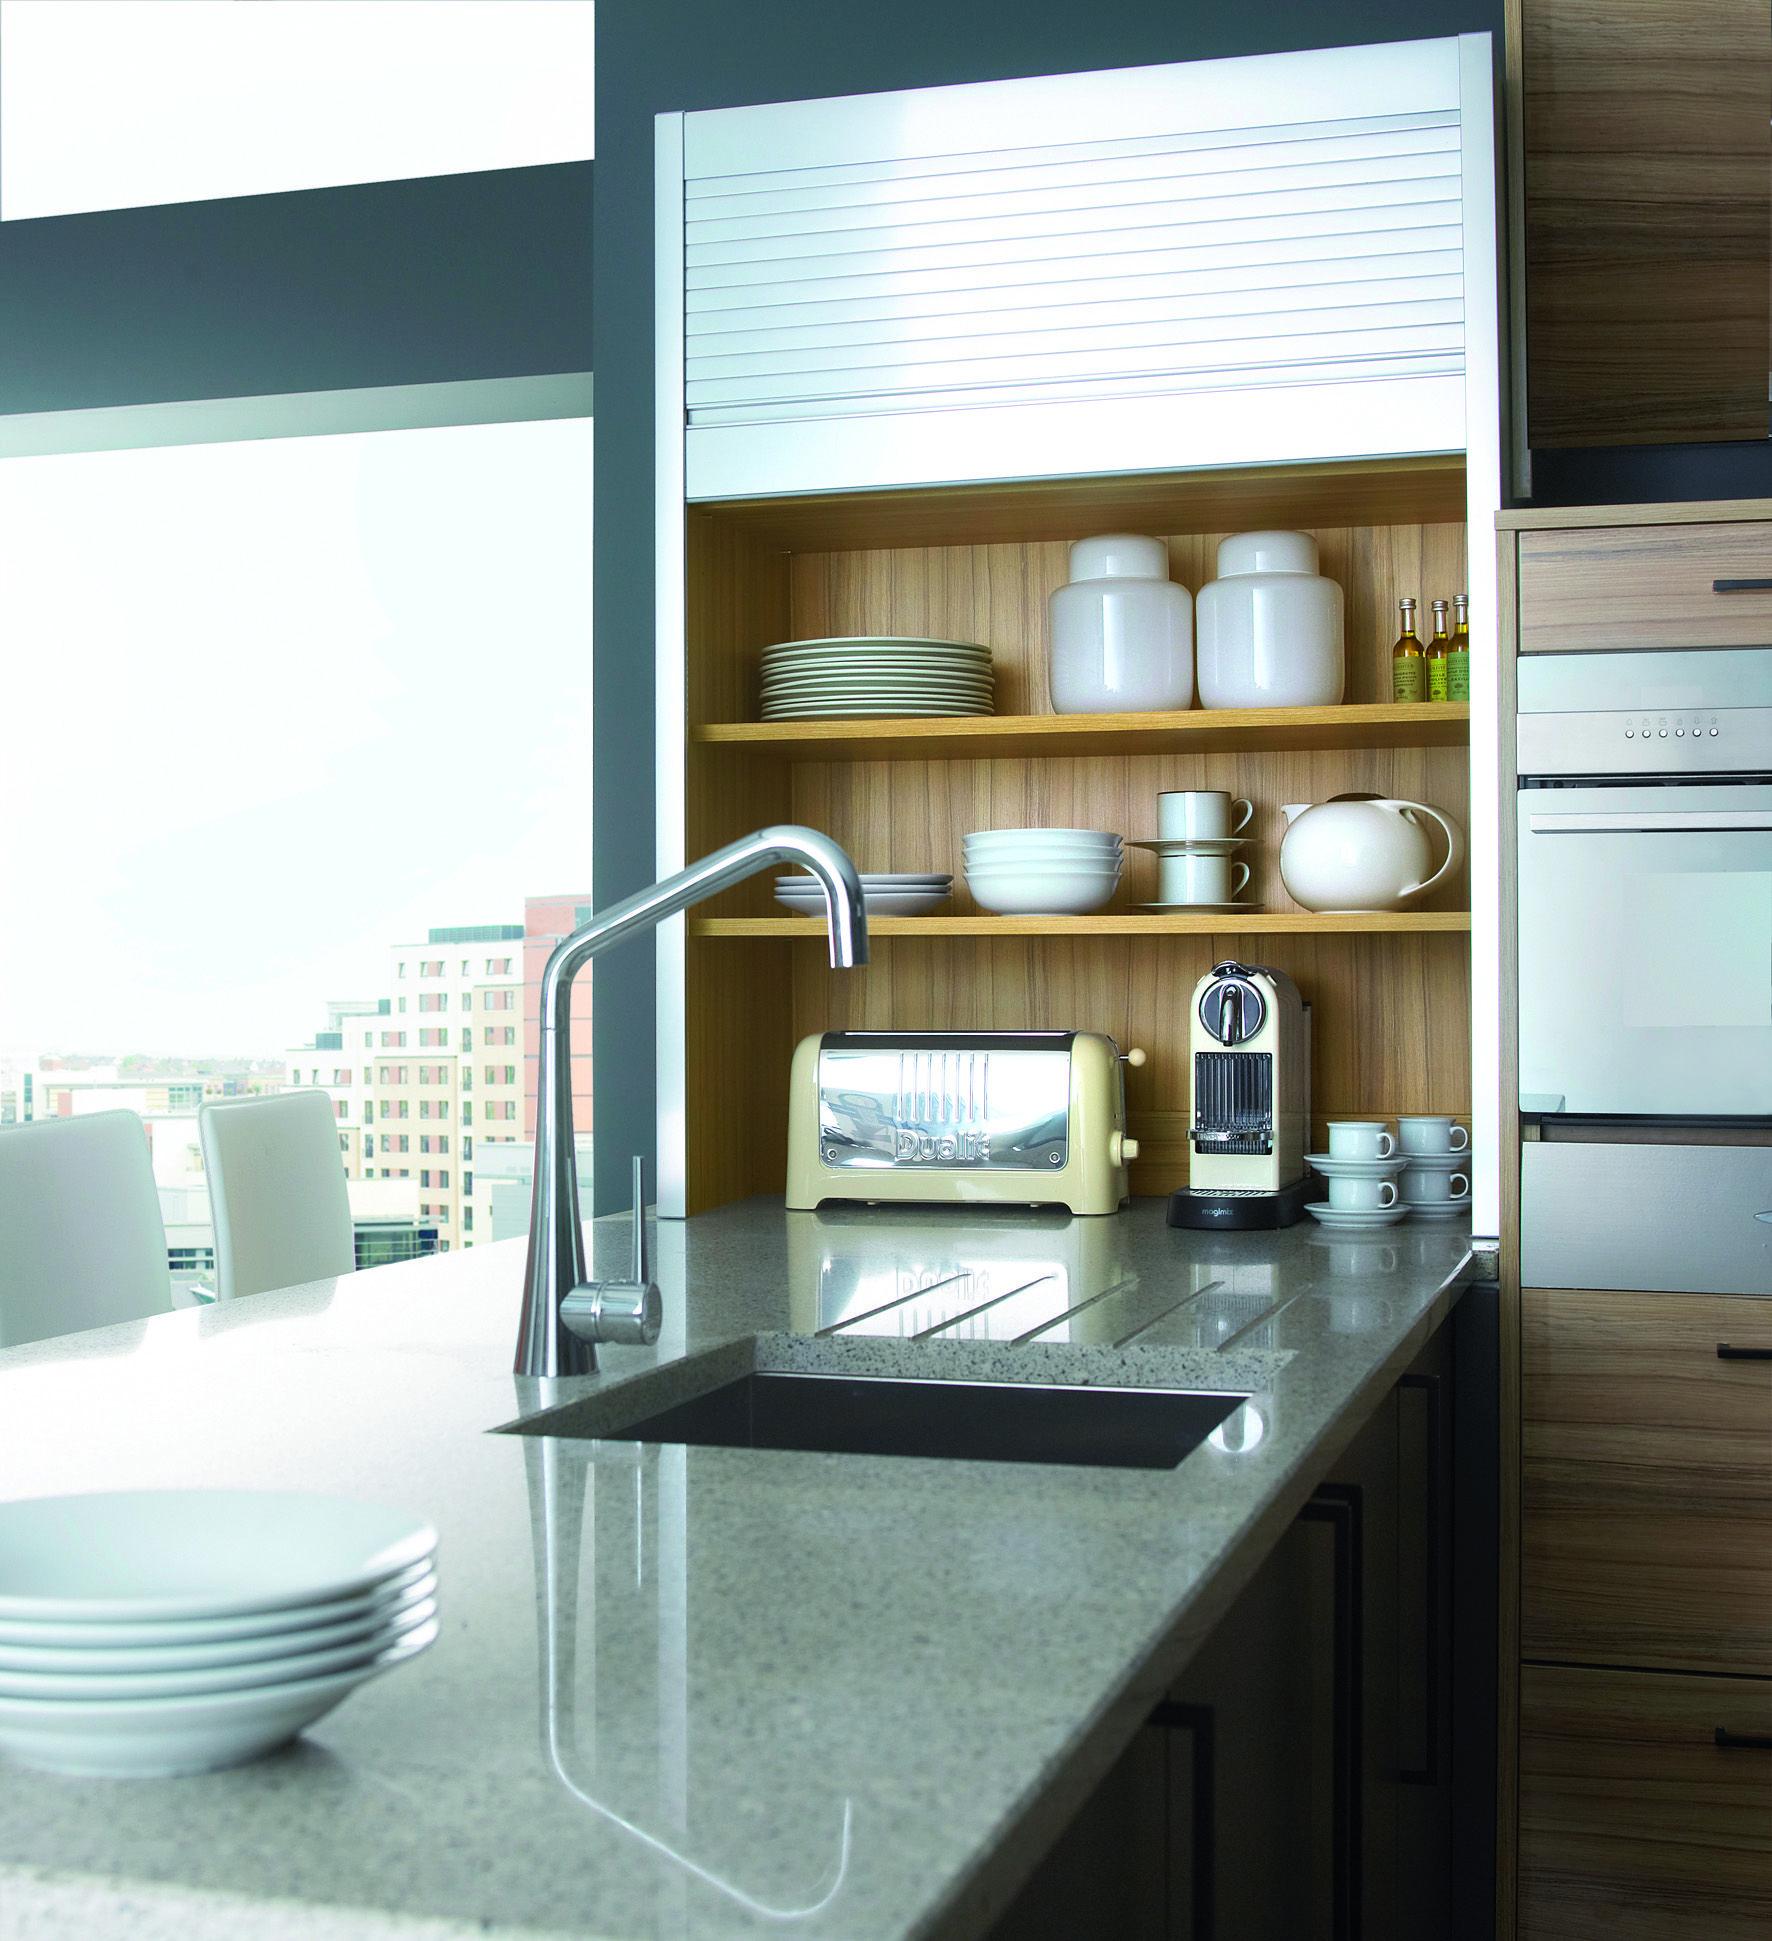 Evergreen kitchens kitchen pinterest evergreen tambour and